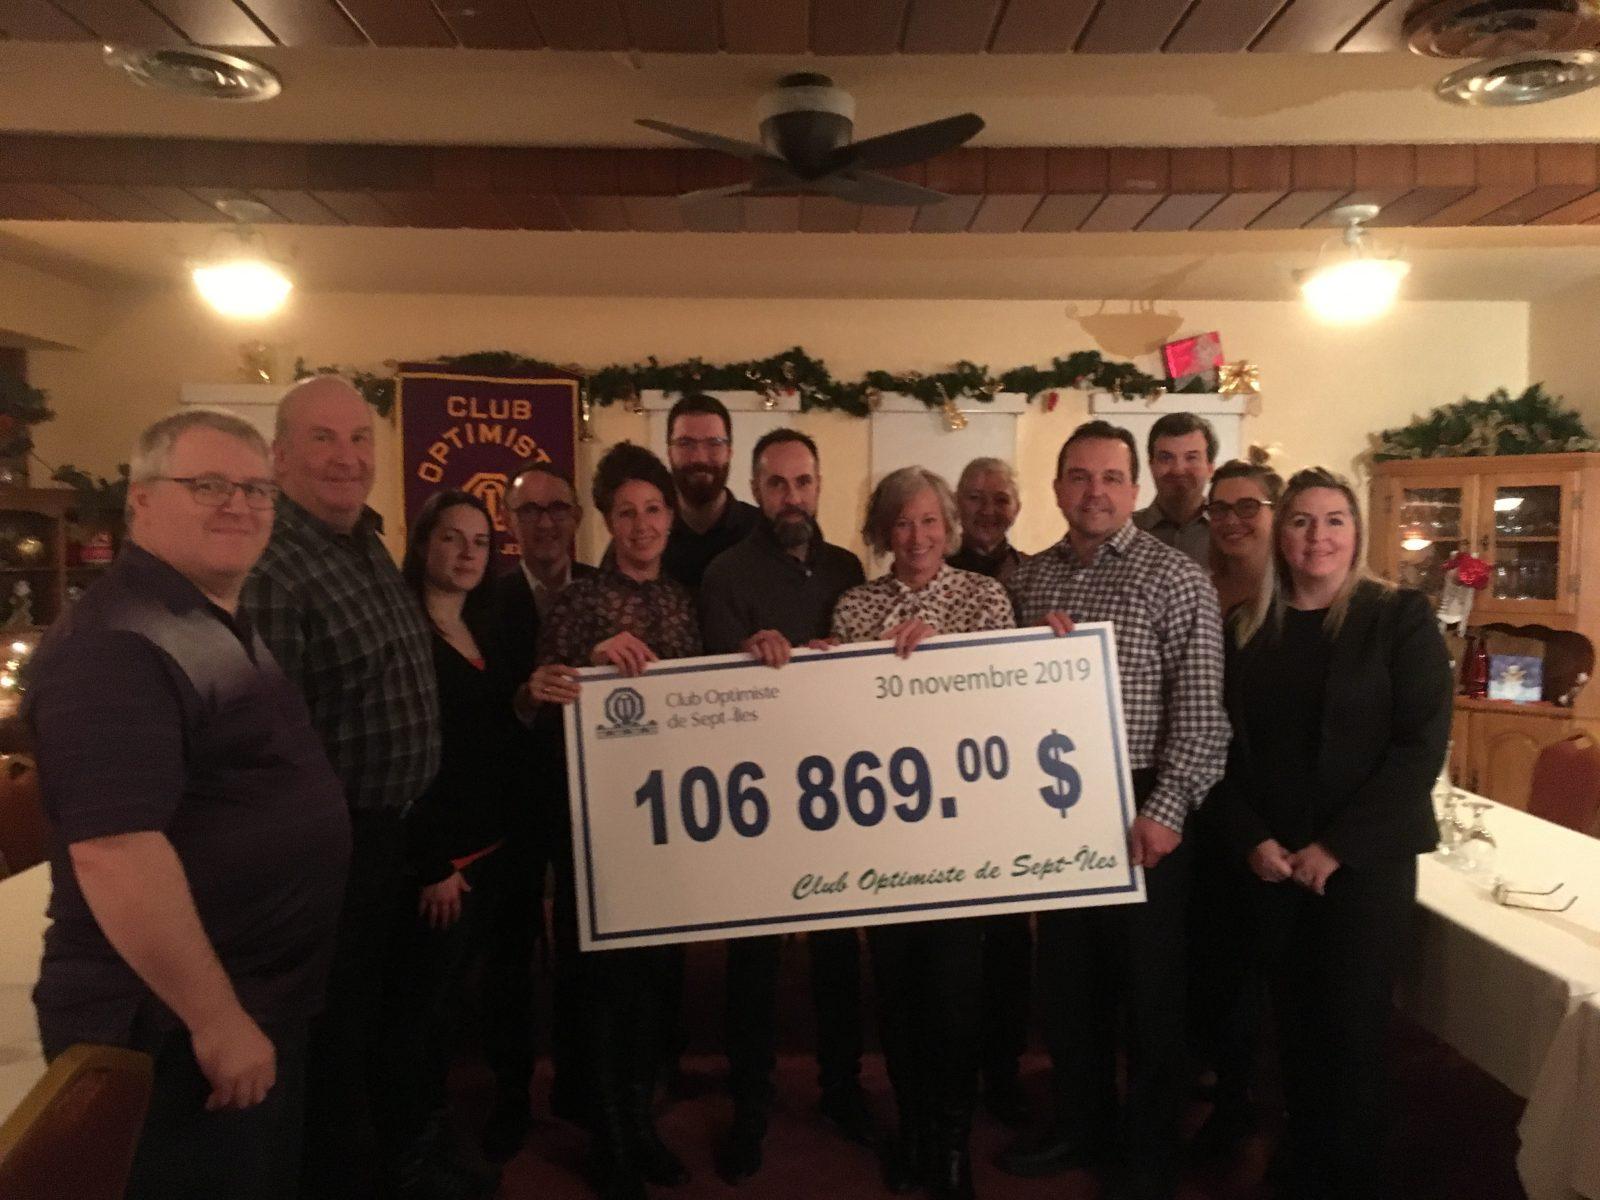 Club Optimiste de Sept-Îles : un souper-bénéfice qui rapporte gros